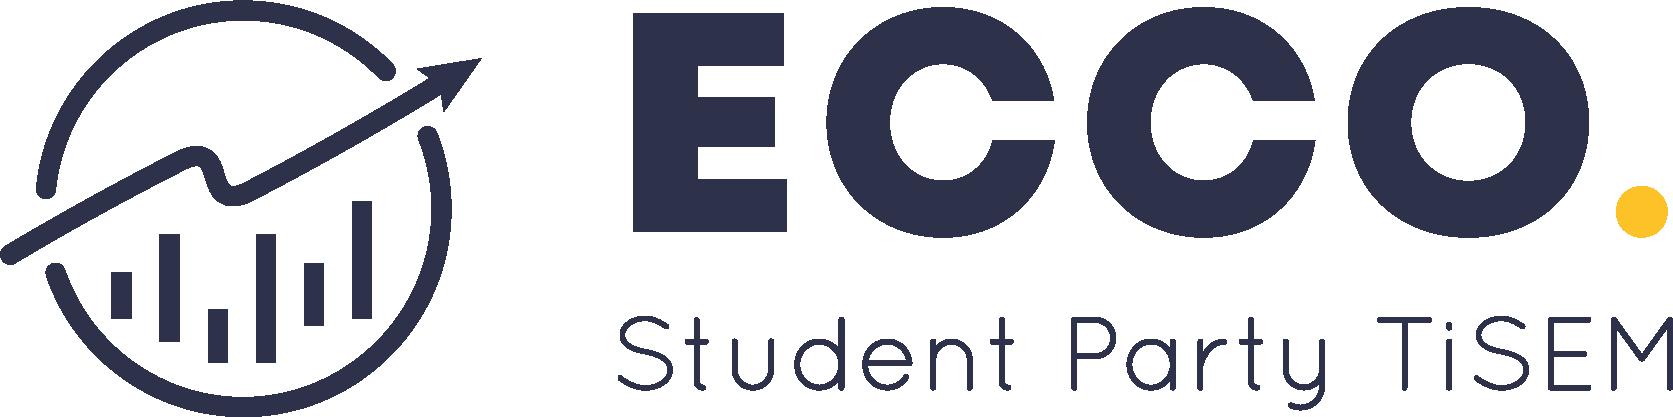 Student party ECCO